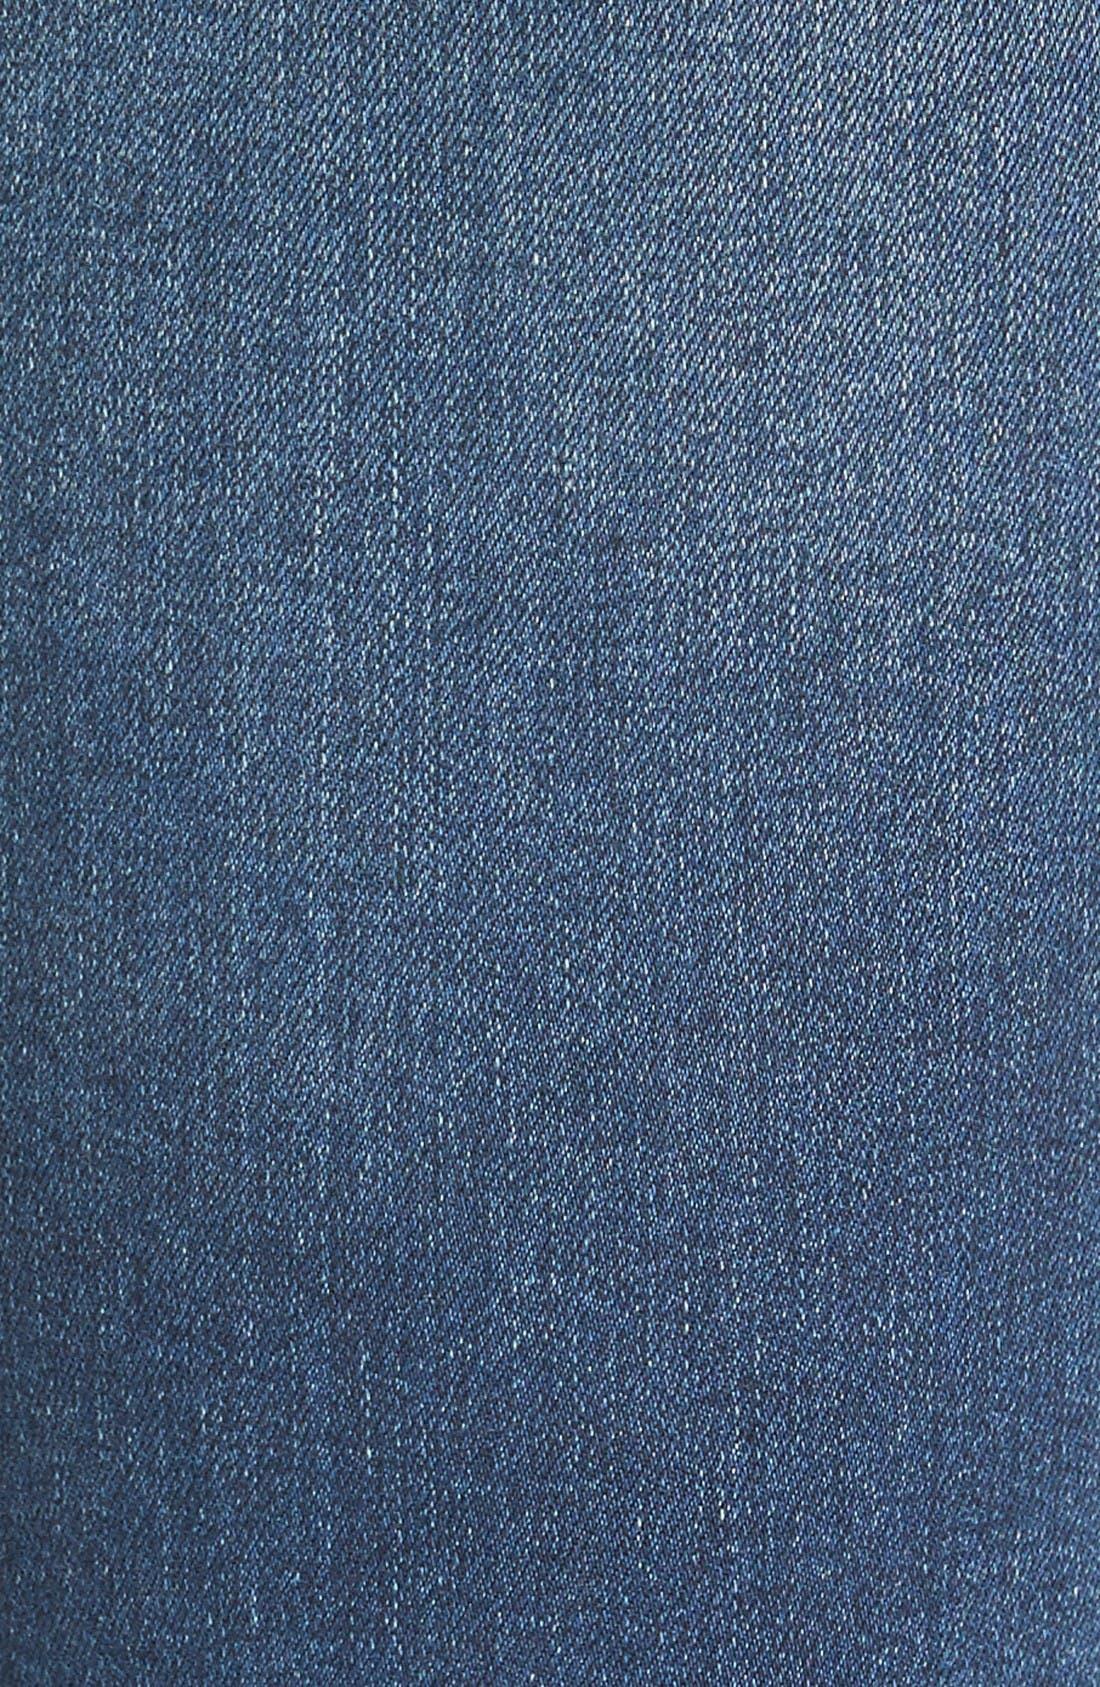 Alternate Image 6  - Articles of Society Sarah Skinny Jeans (Bancroft)